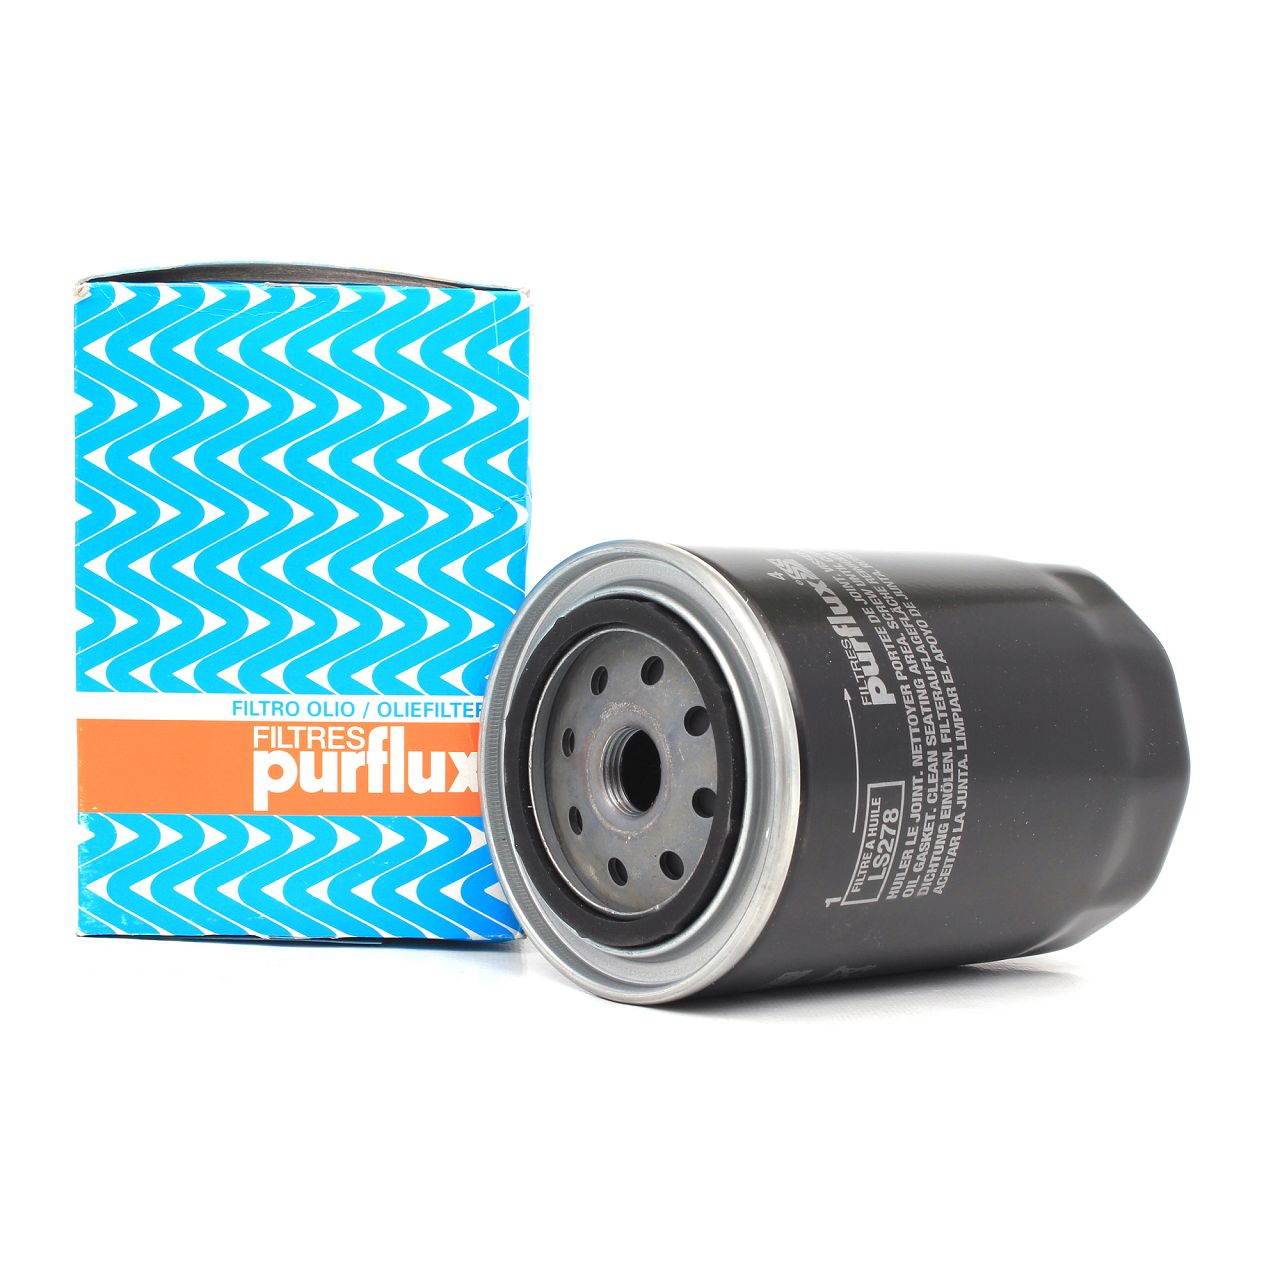 PURFLUX Ölfilter Motorölfilter für Audi A4 A6 Cabrio VW Passat 1.9TDI LS278